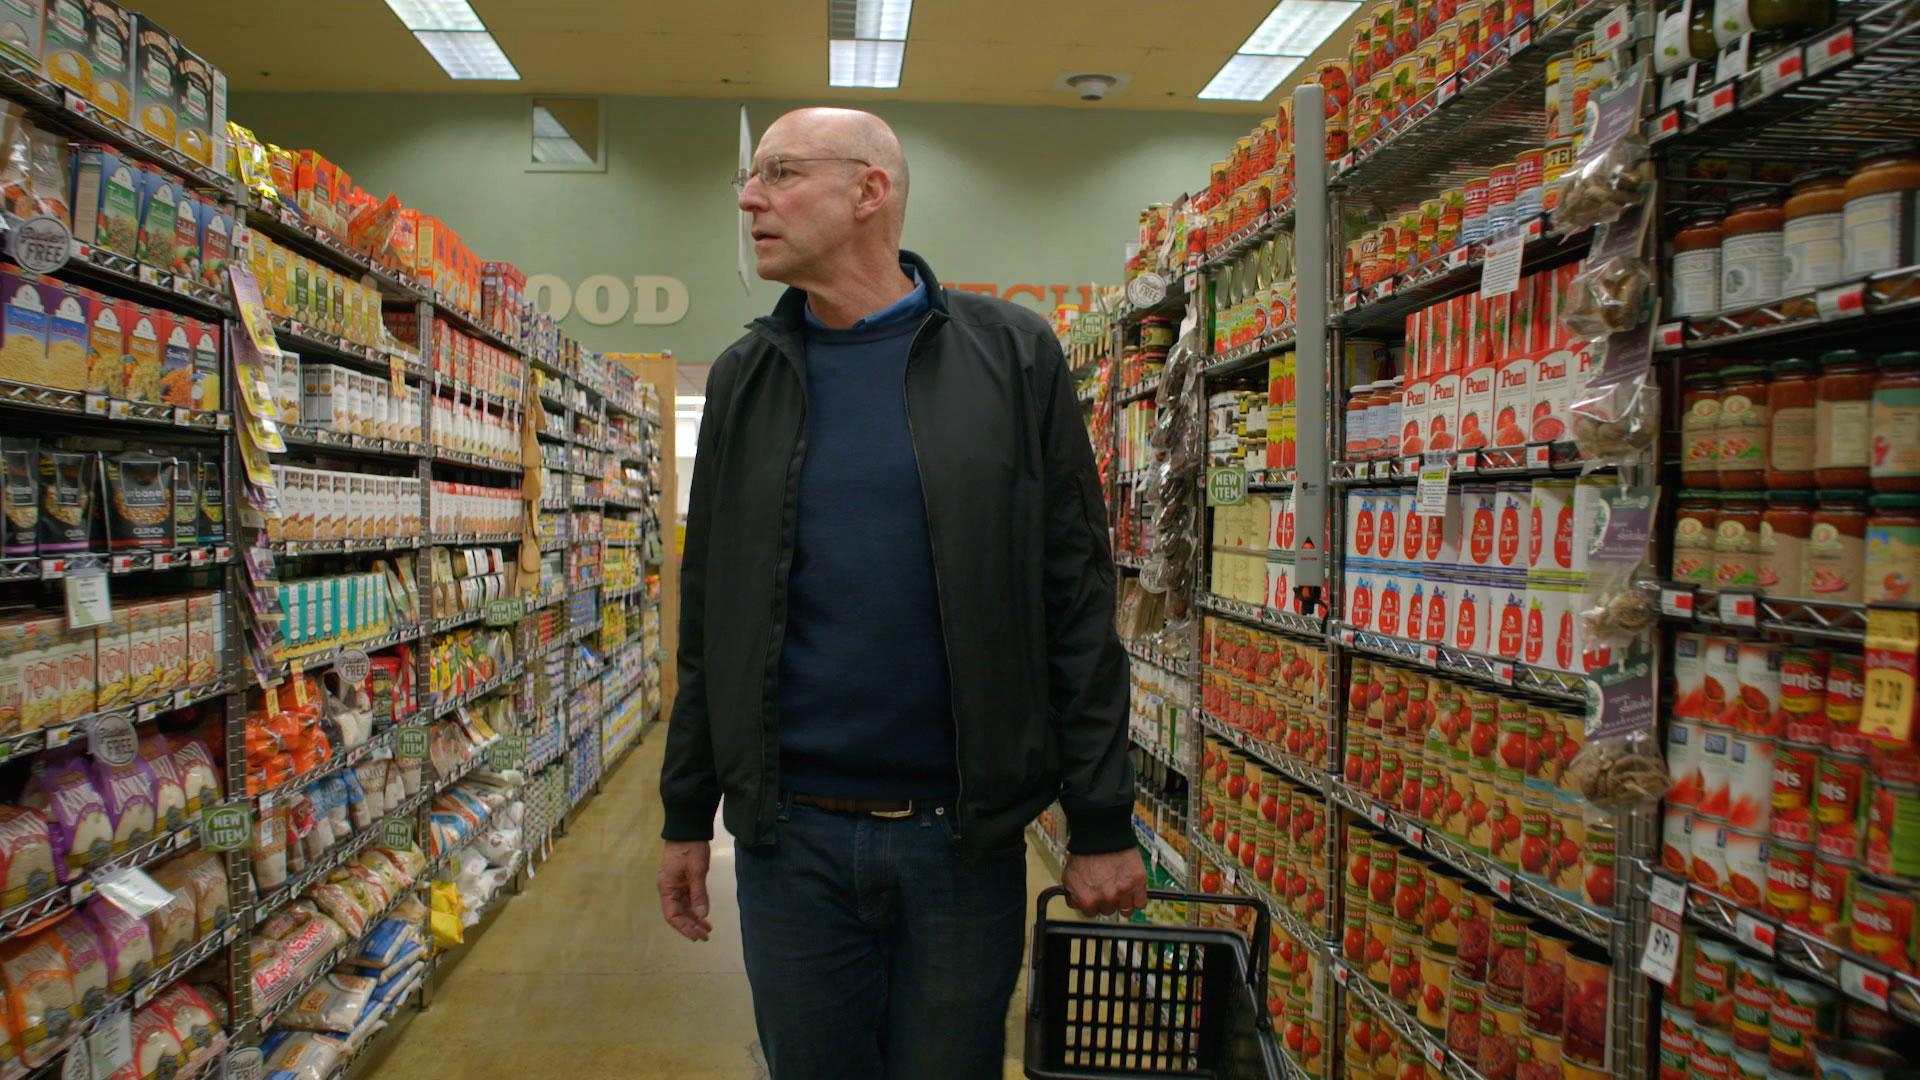 Michael Pollan, In Defense of Food